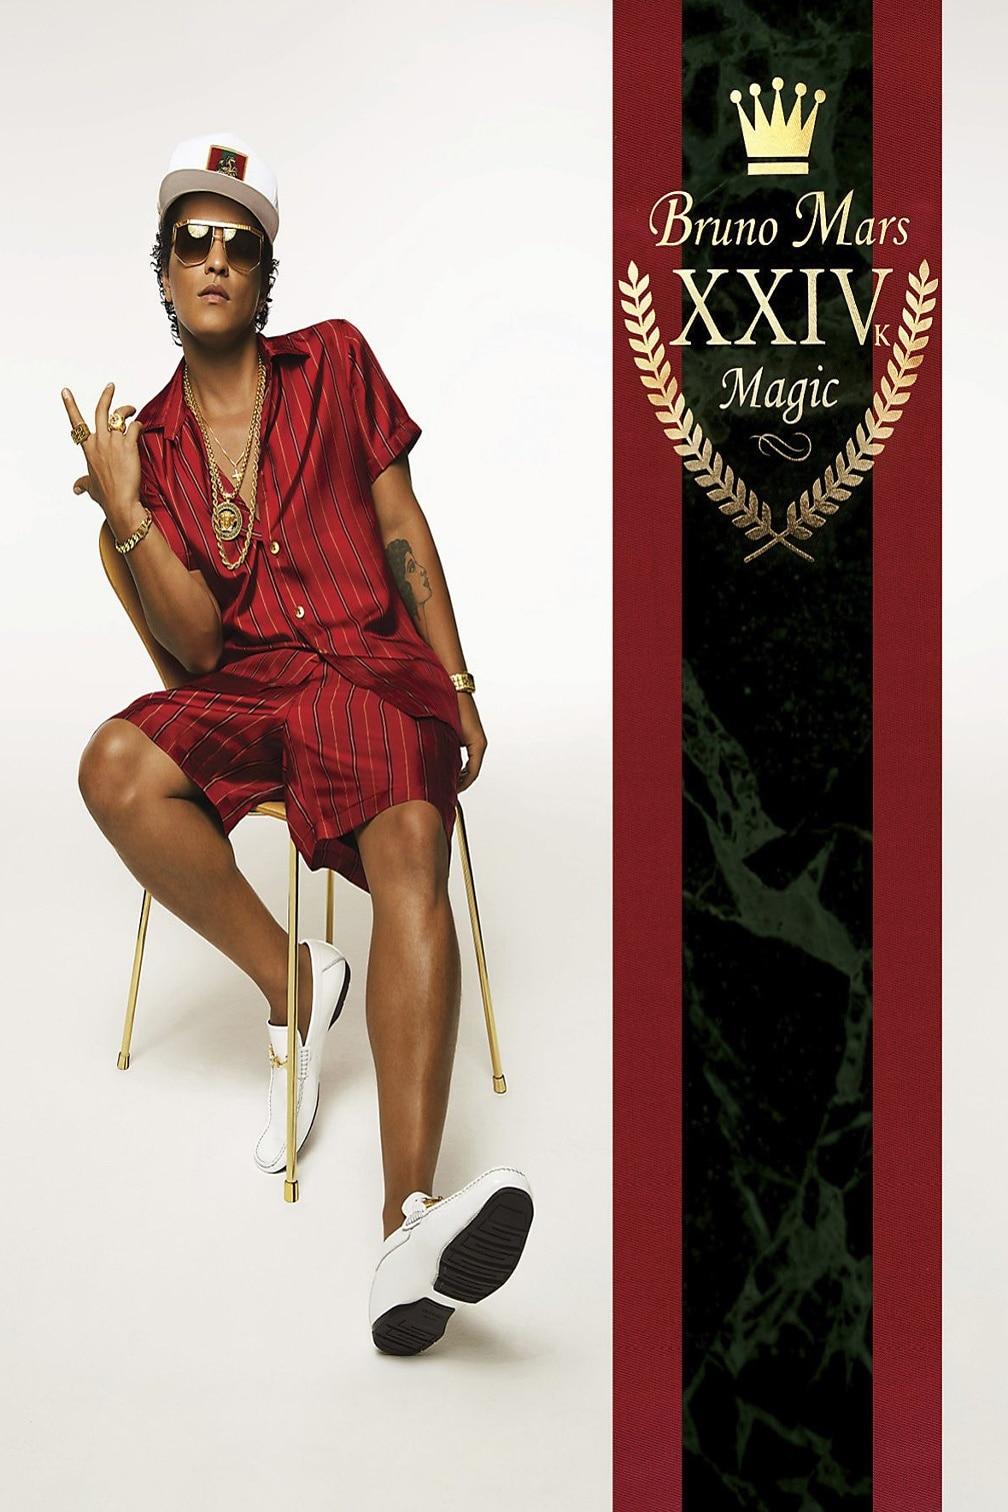 H007 Hot Bruno Mars Magic XXIV Pop Rap Music Star Art Silk Fabric Poster 36 x 24